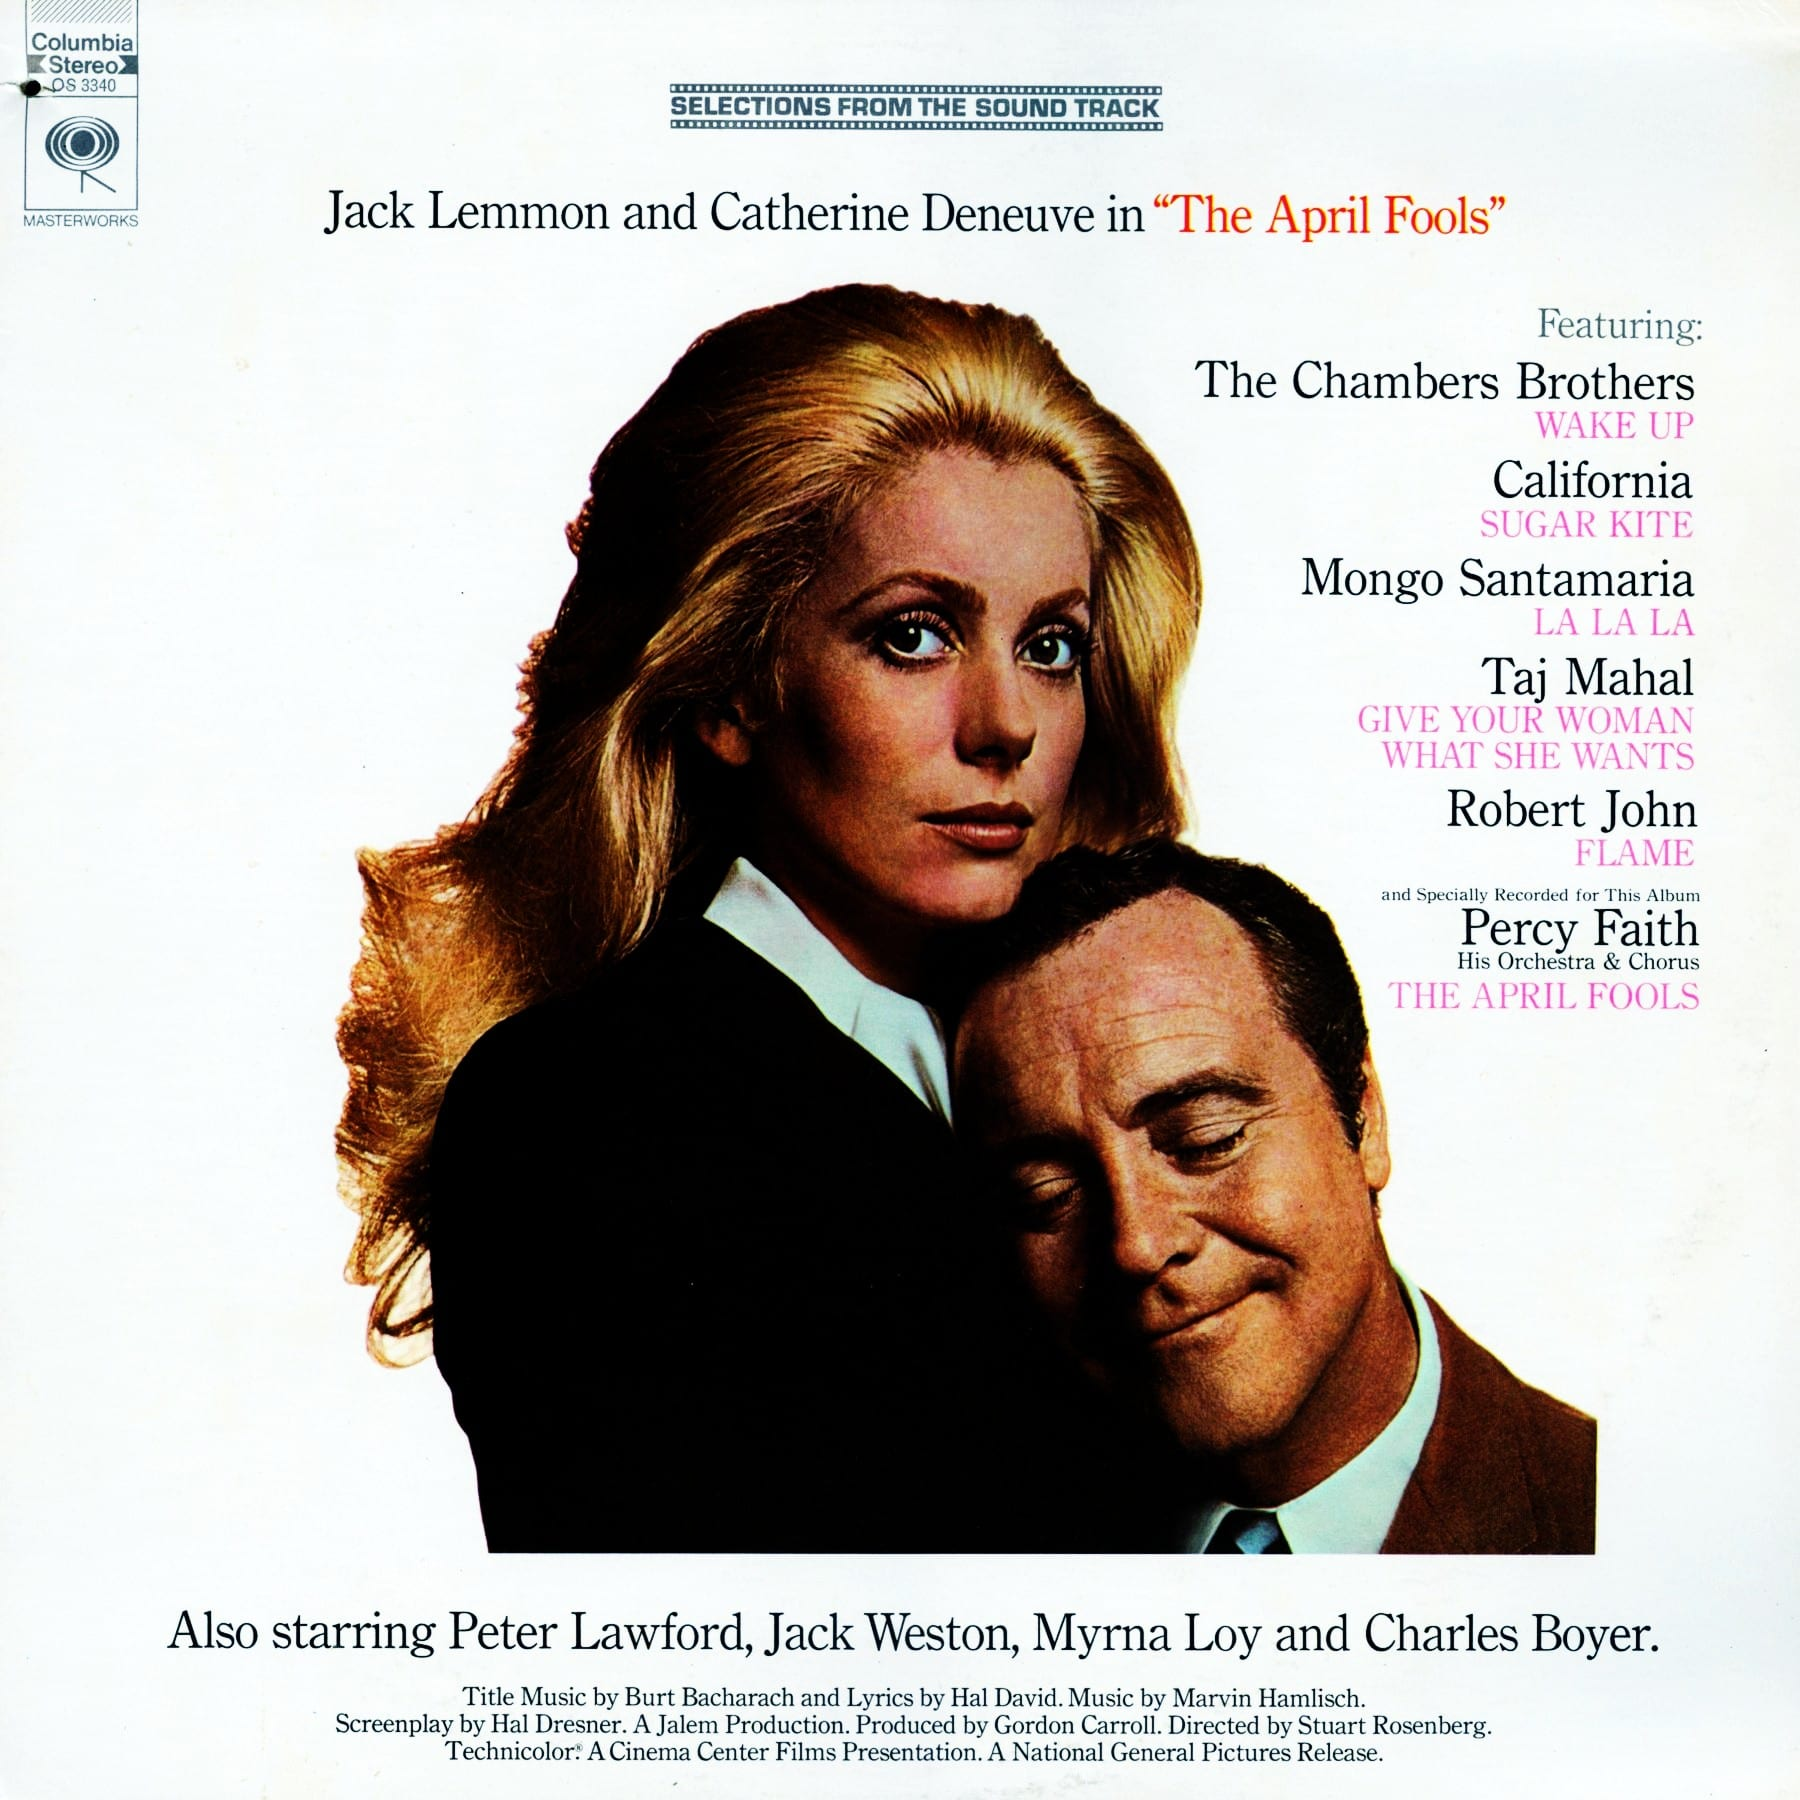 Chris knight & Maureen McCormick - Chris knight & Maureen McCormick (1973) CD 9